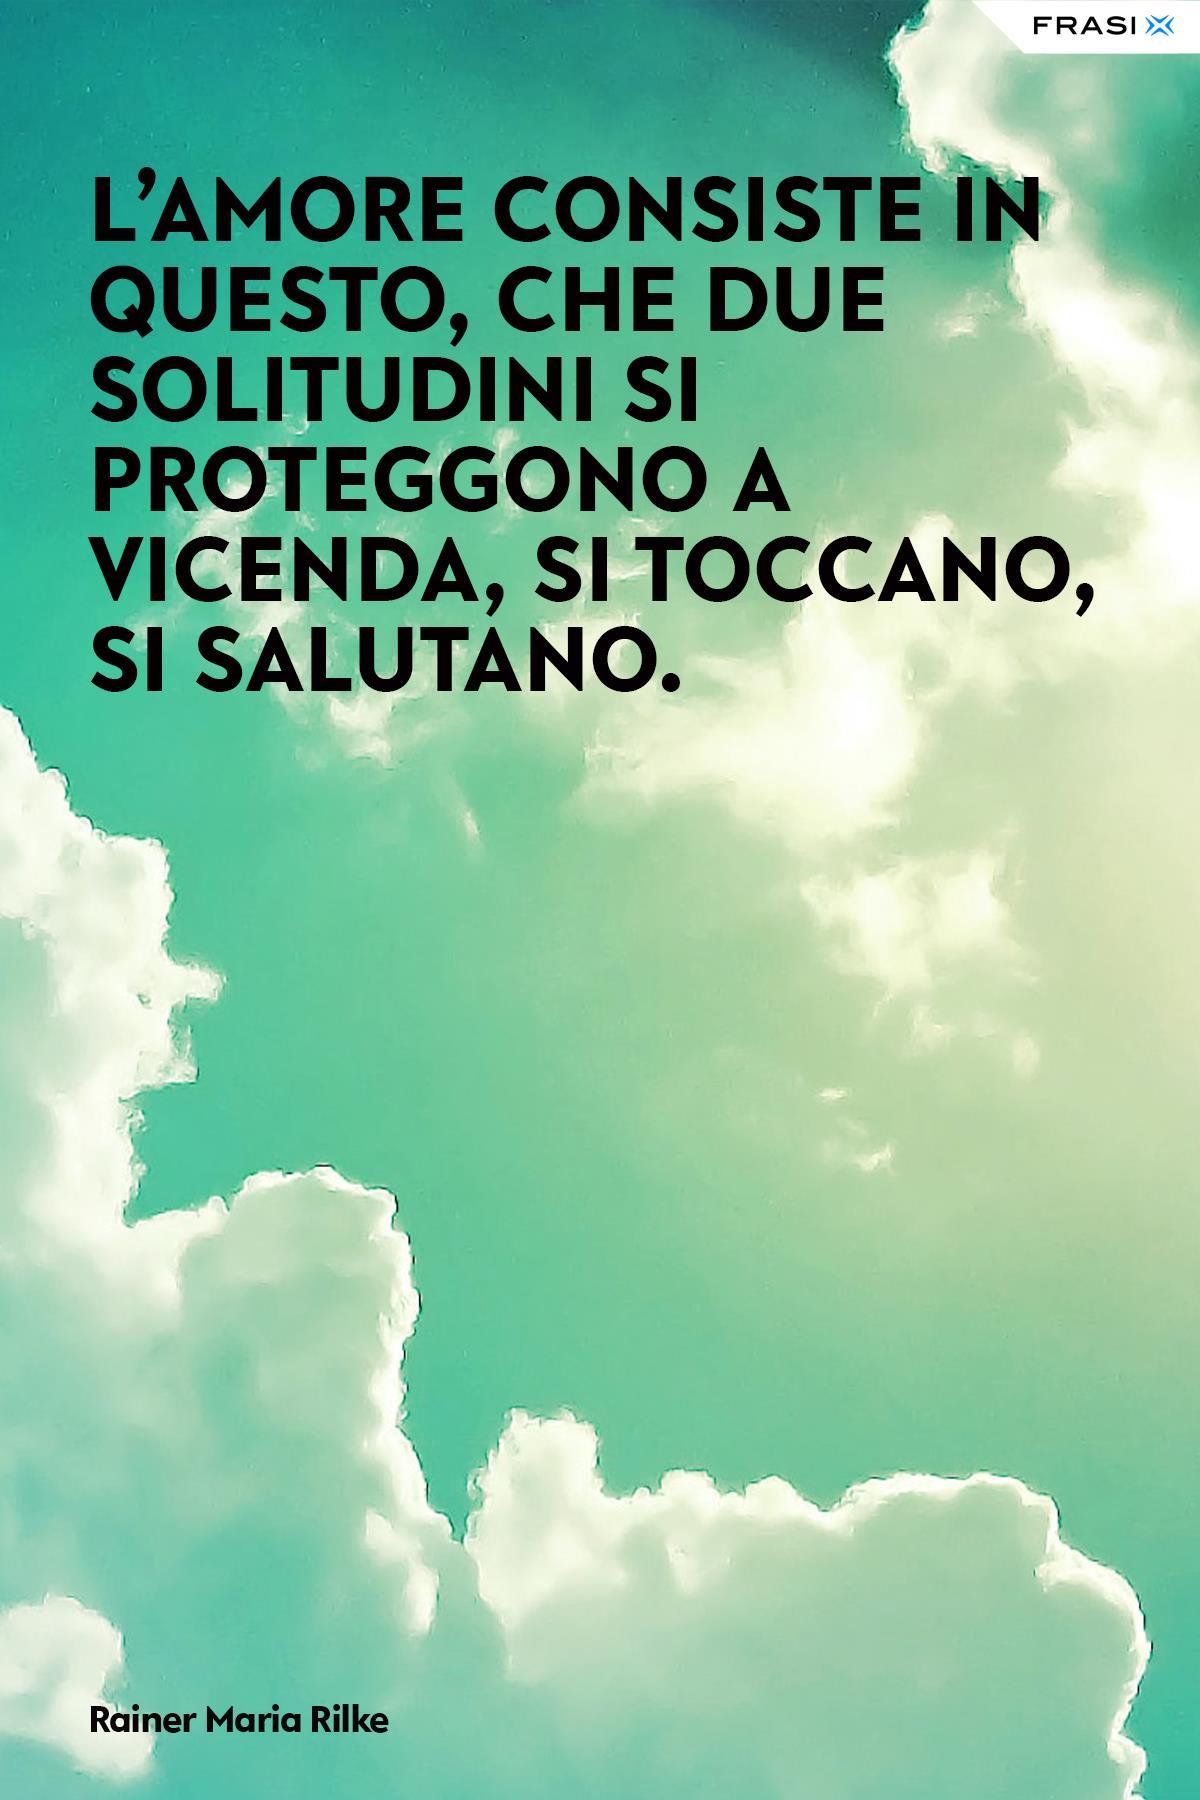 Aforismi d'amore vero Rainer Maria Rilke